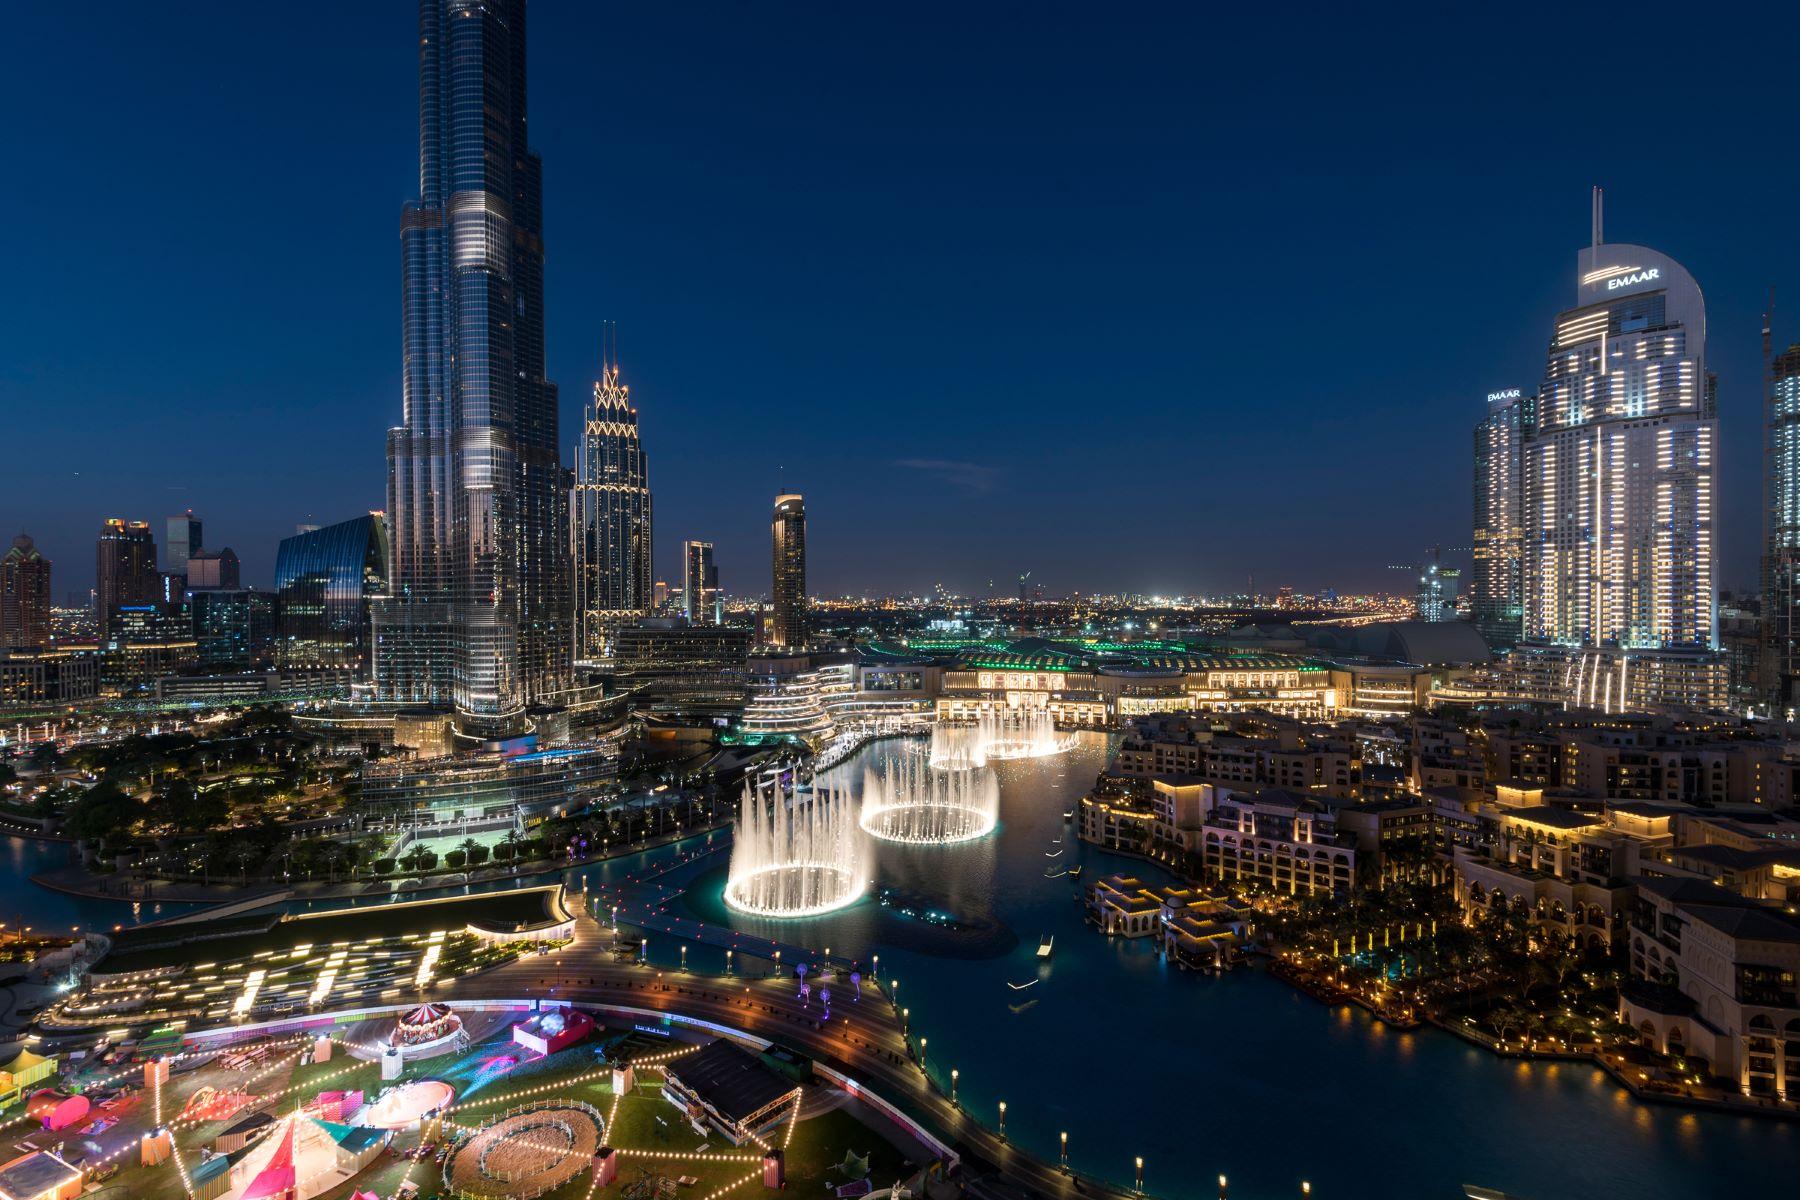 Apartment for Sale at The Residences Tower 3 Downtown, Dubai, Dubai United Arab Emirates